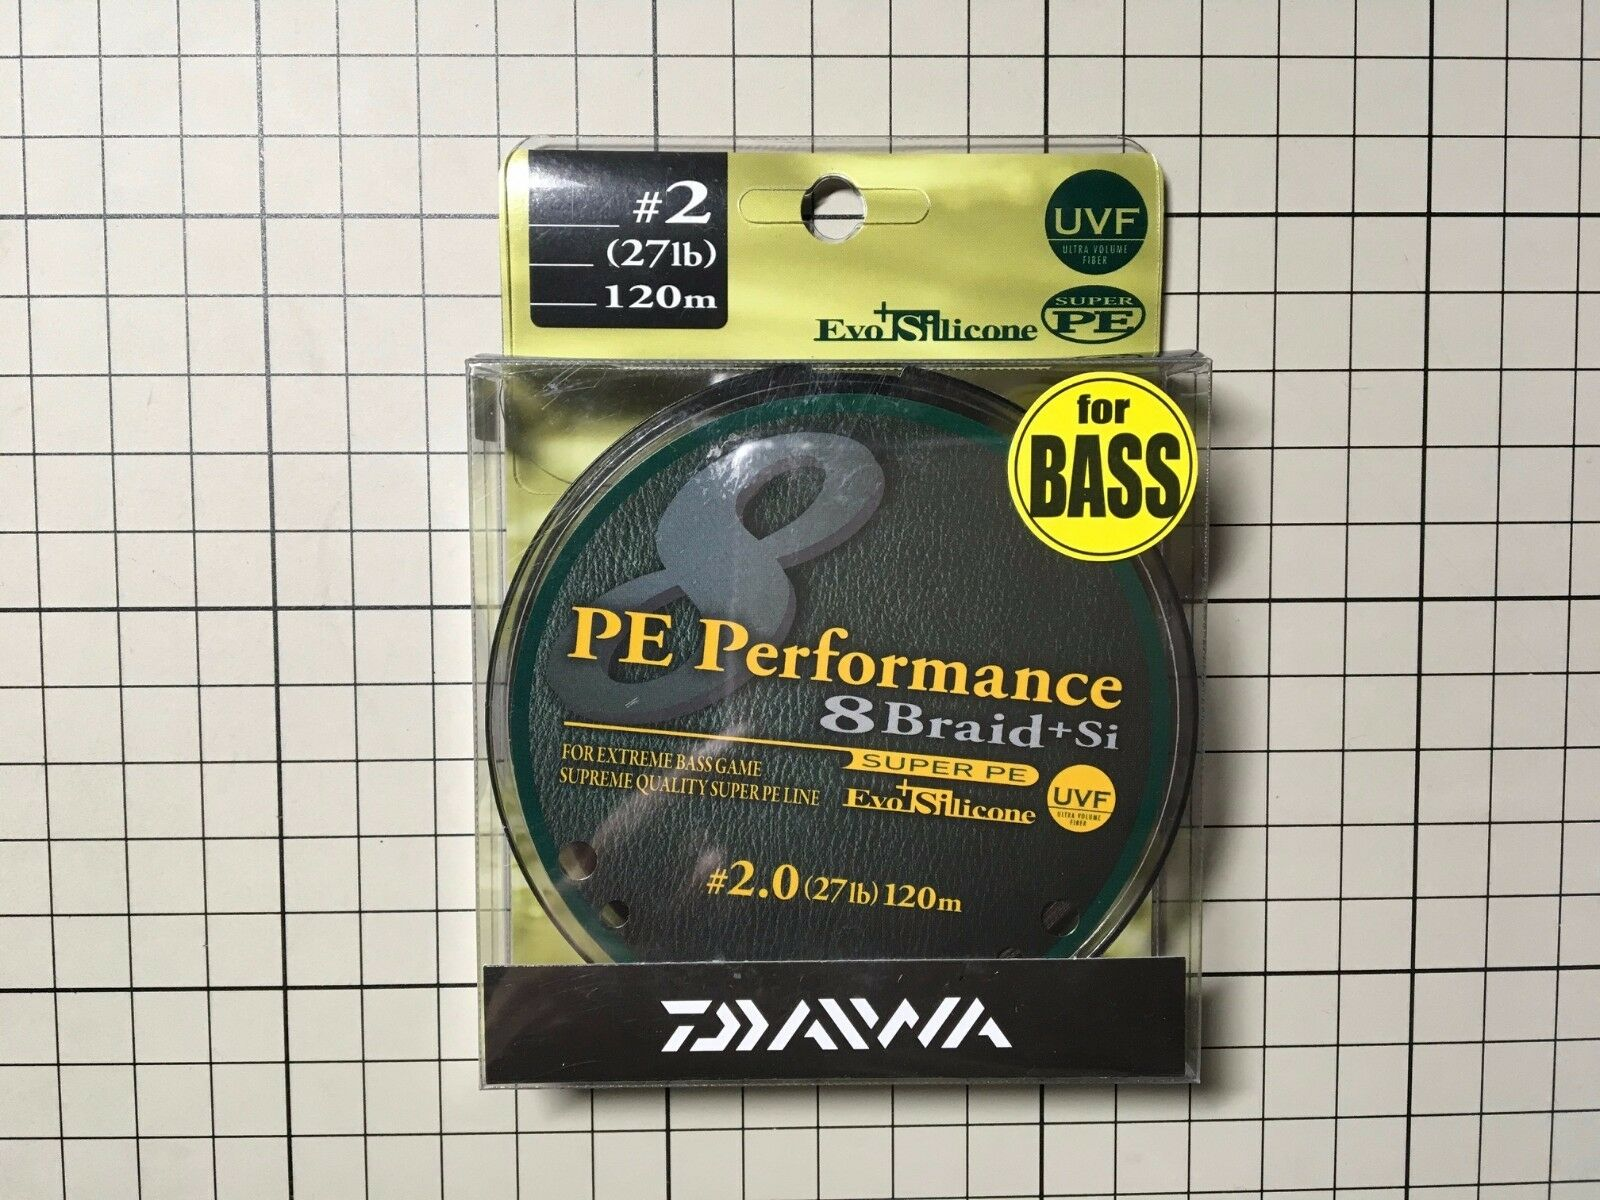 Daiwa PE performance 8 Braid Si UVF bass special line  2 (27lb) 120m